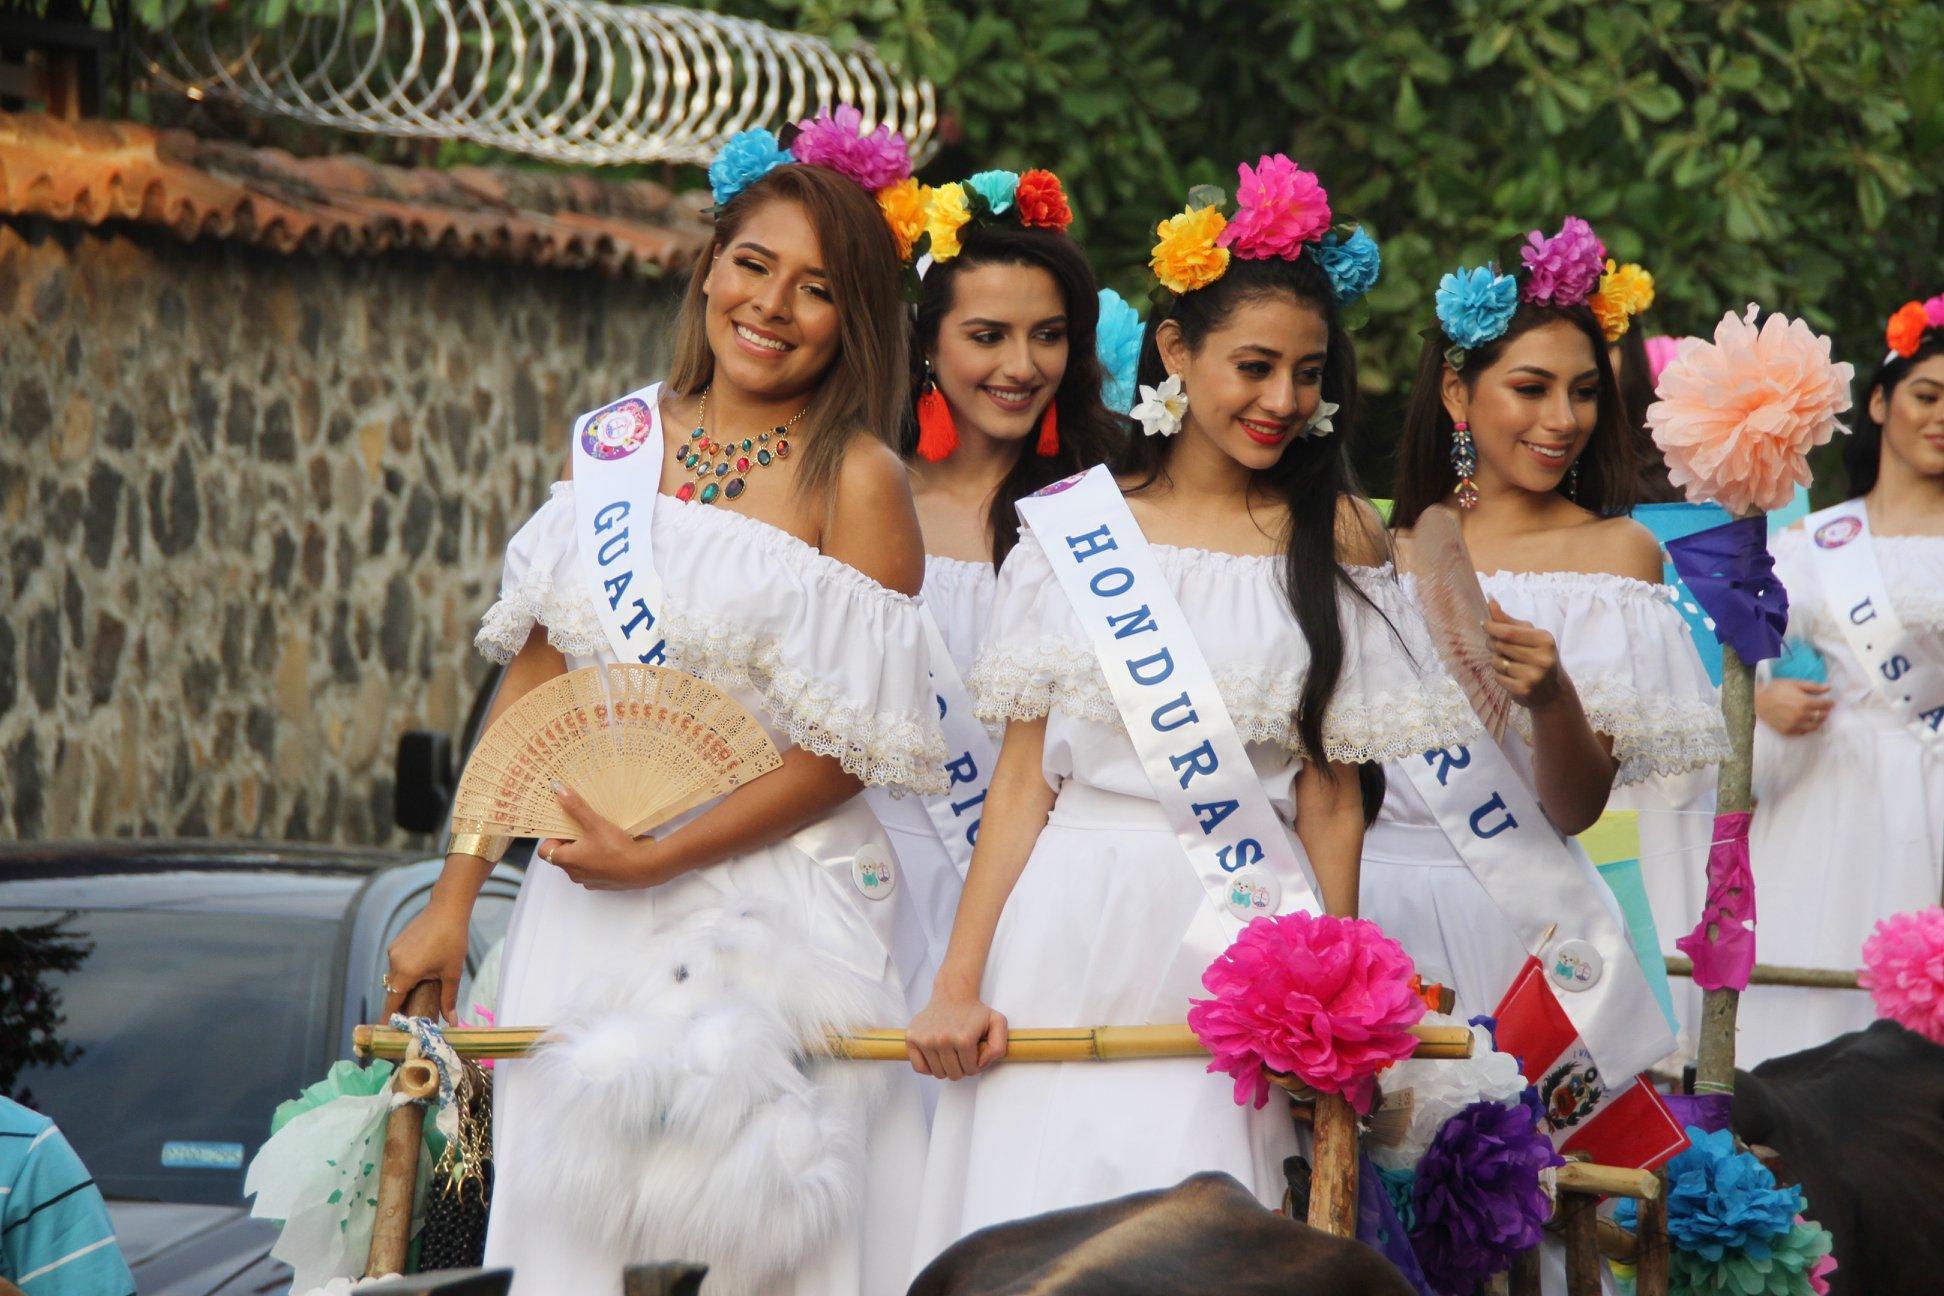 romina lopez, top 12 de miss teen mundial 2019. - Página 3 60764110